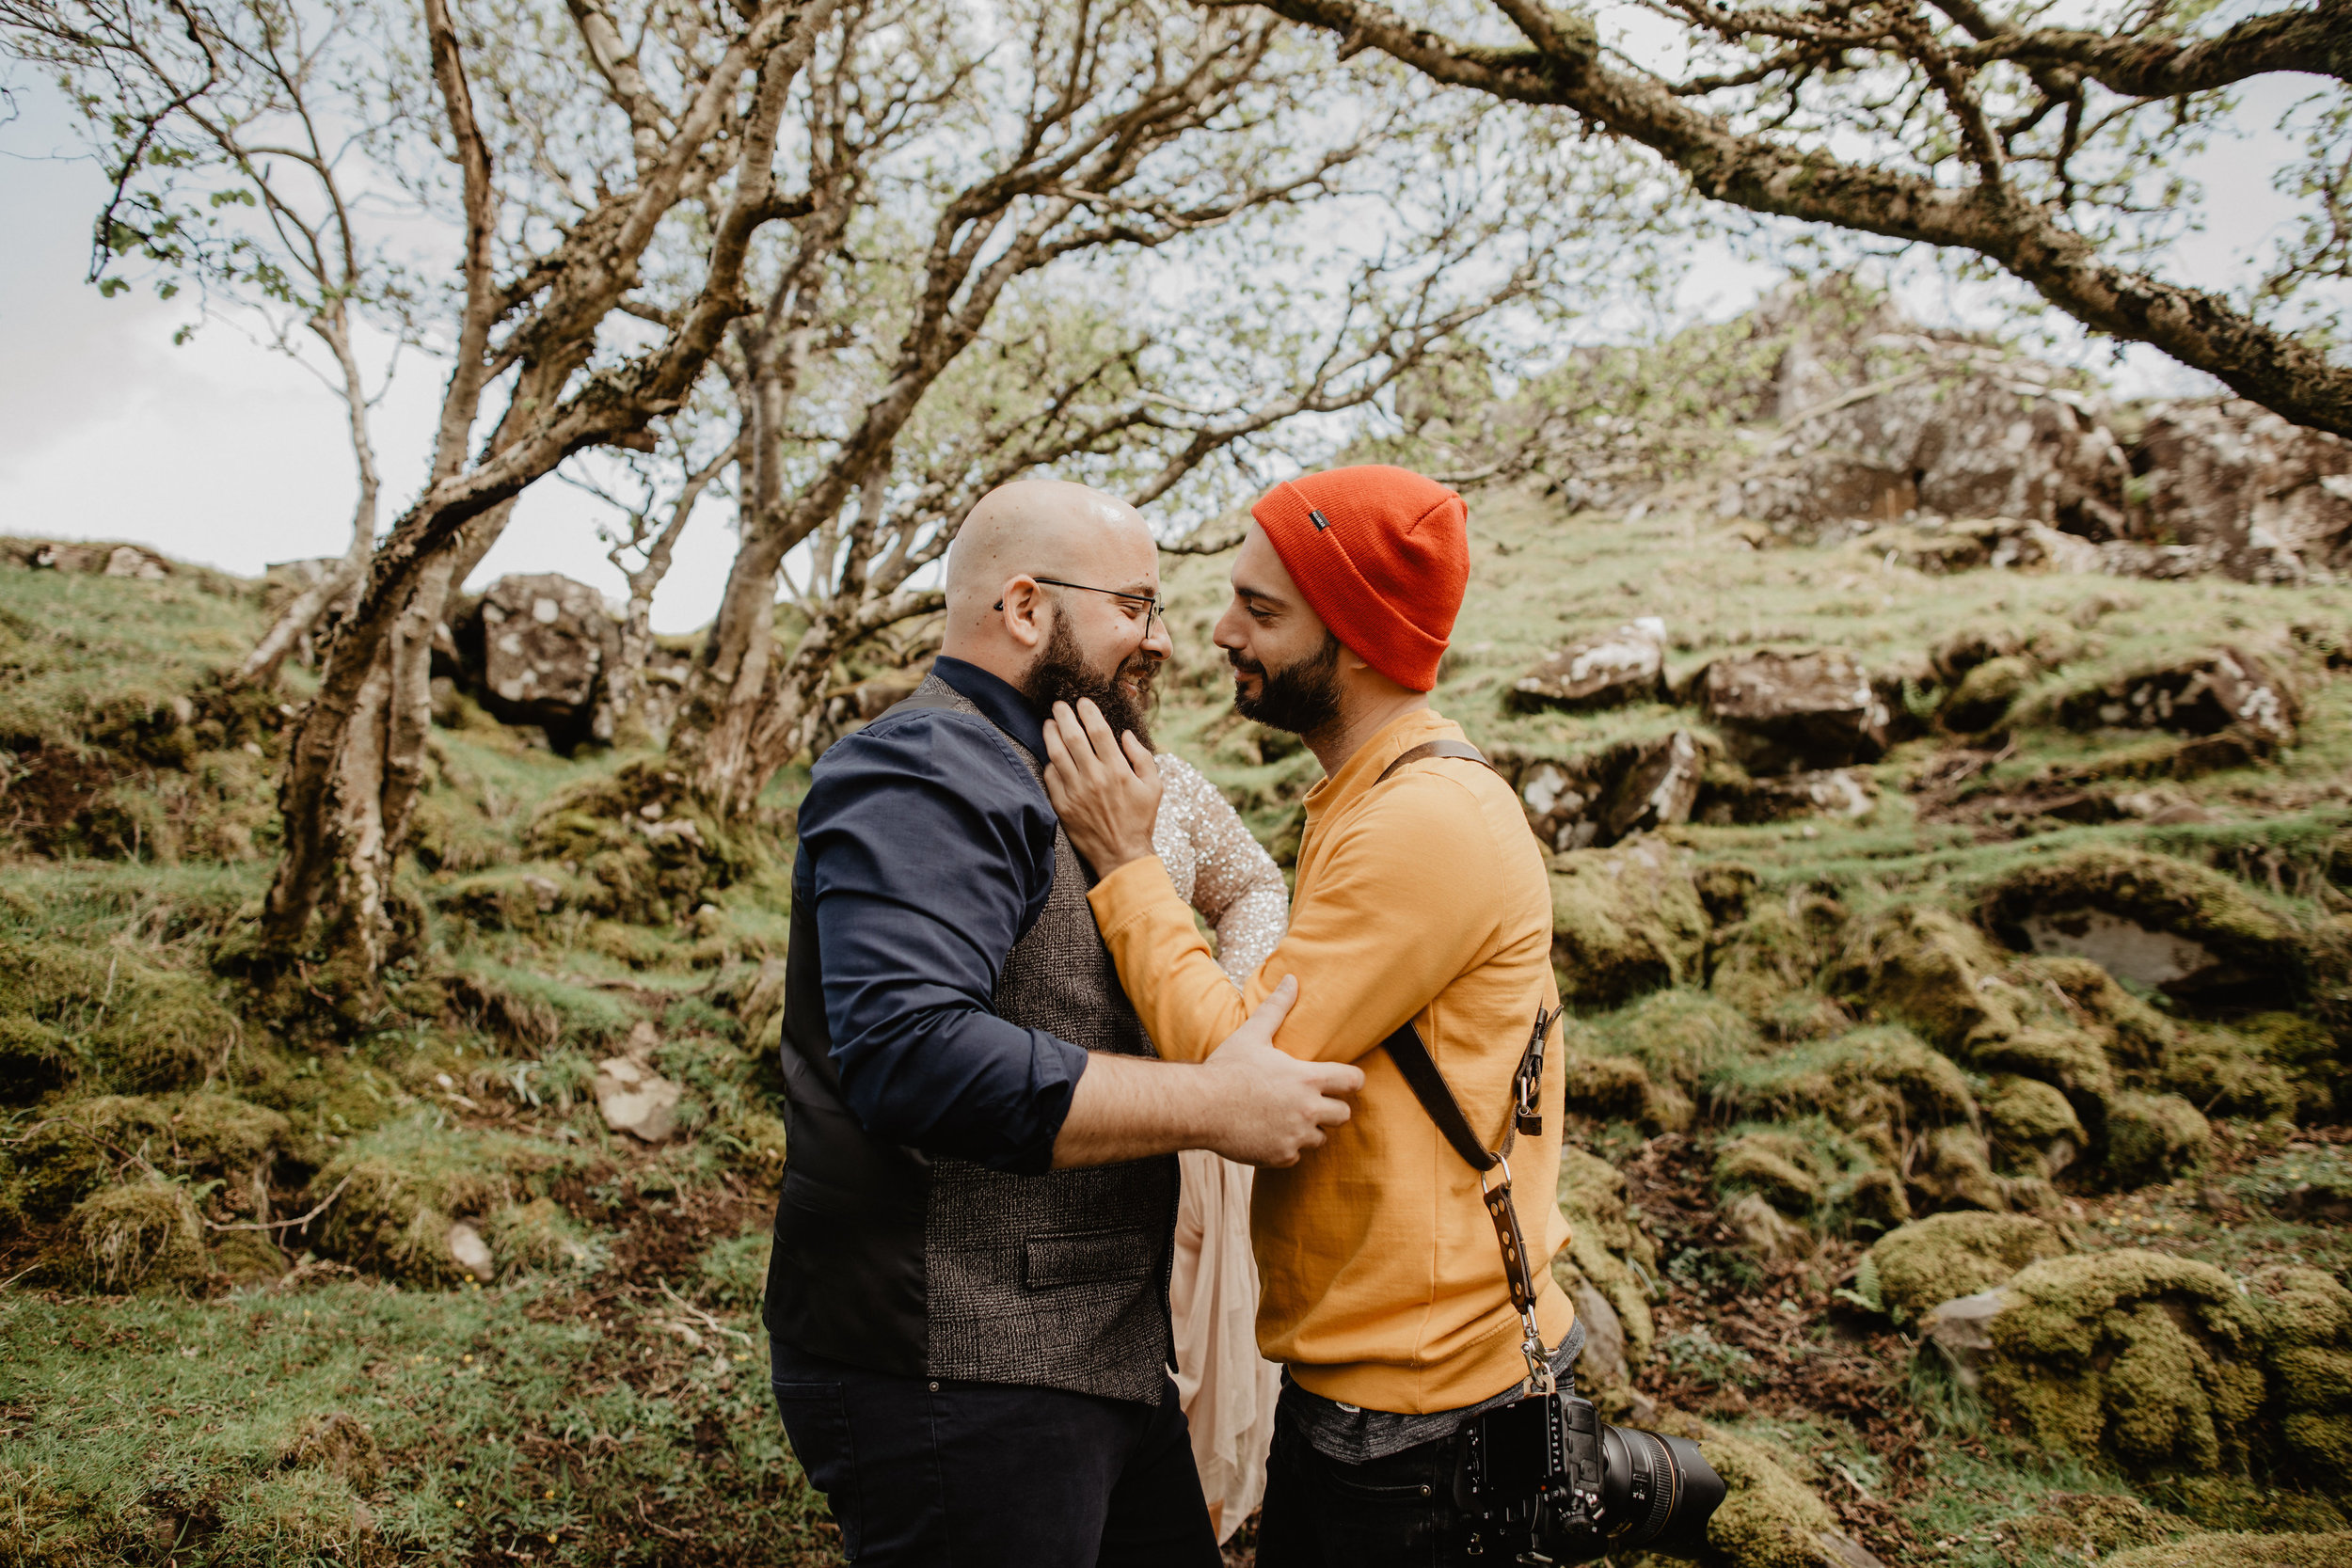 Lapela-photography-Isle-of-Skye-elopement-BTS-110.jpg